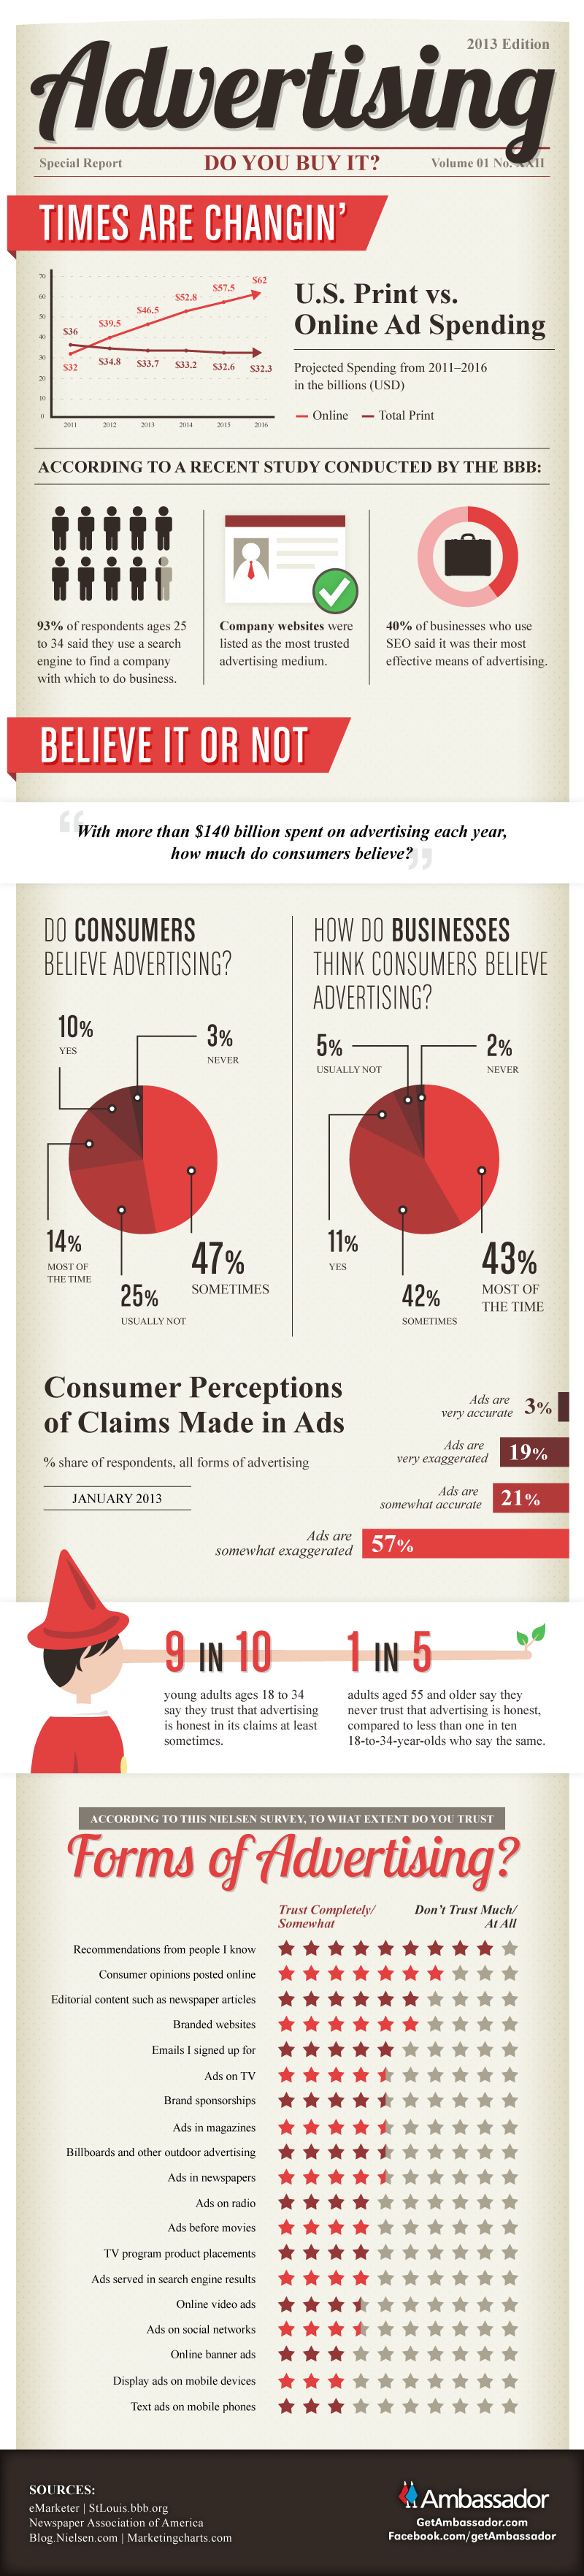 advertising-infographic